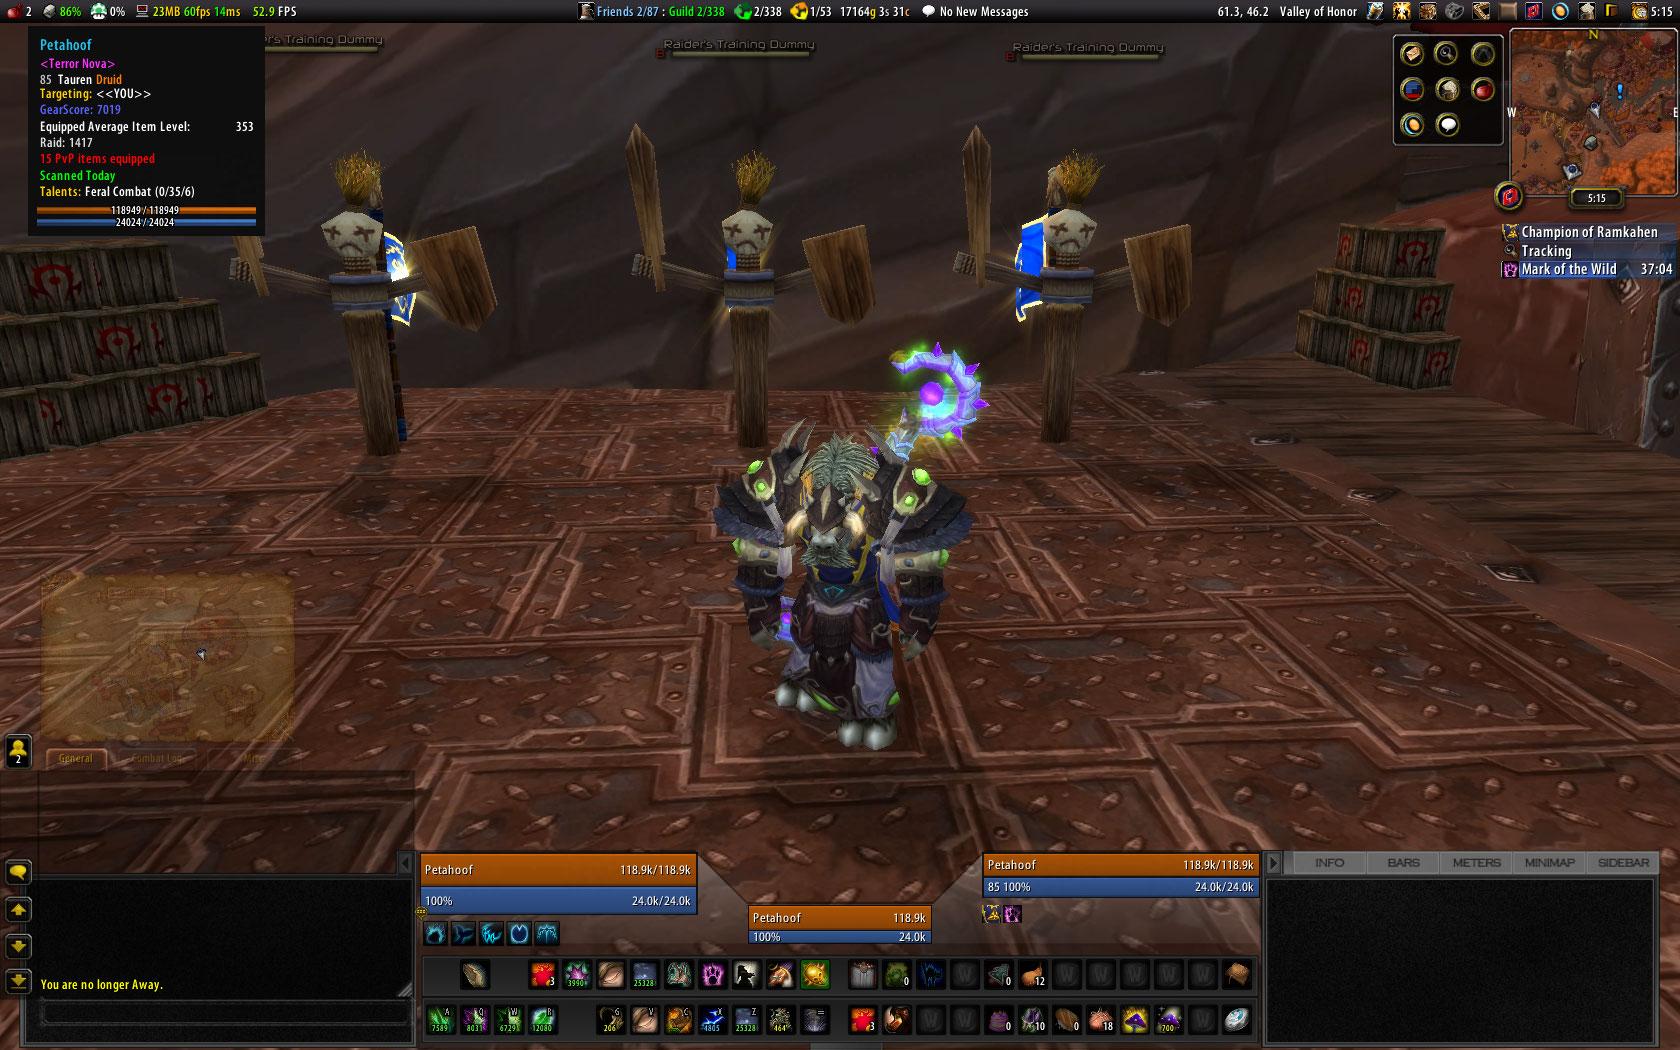 Petahoof's World of Warcraft Druid Key Bindings